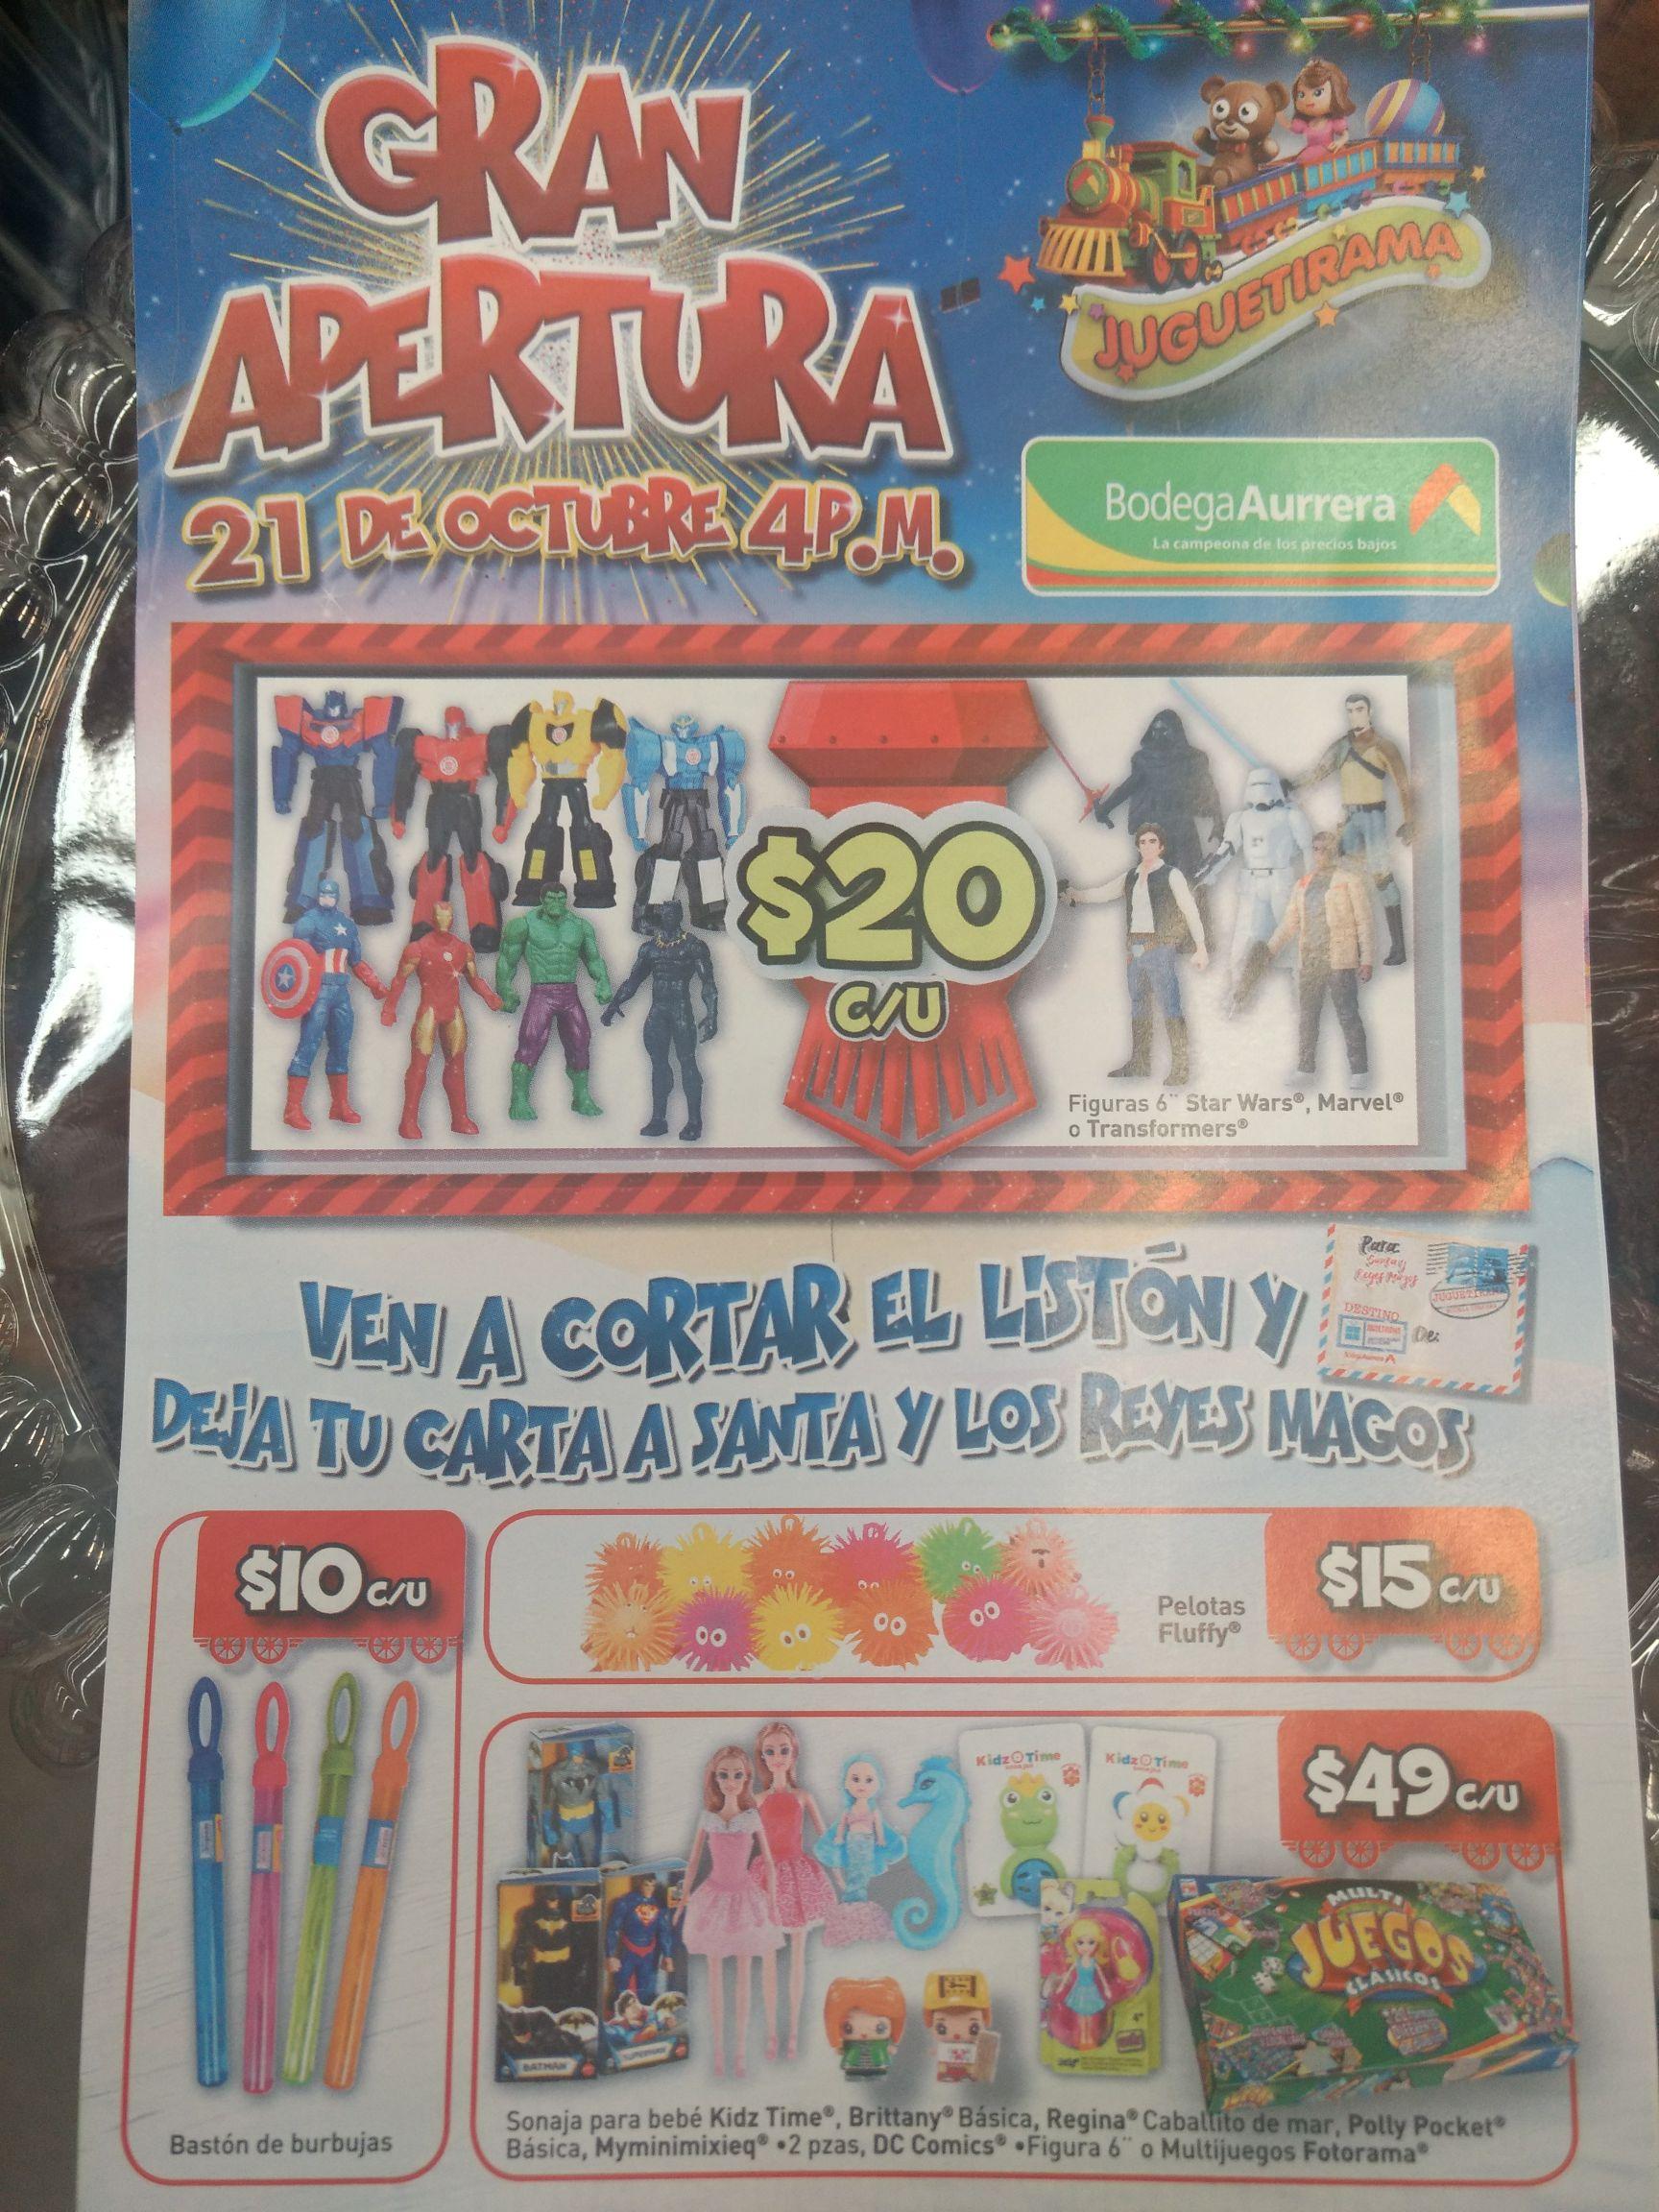 Bodega Aurrerá: Juguetirama, Juguetes desde $15